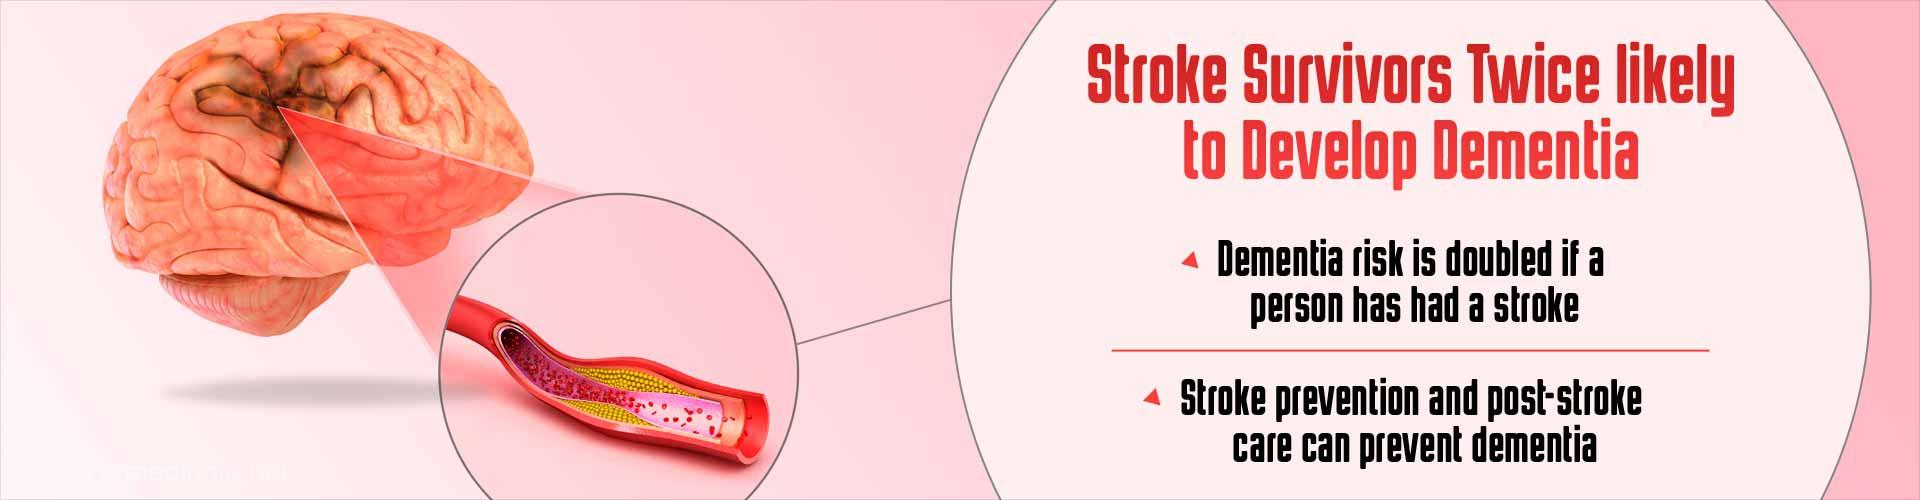 Stroke Doubles Risk of Dementia